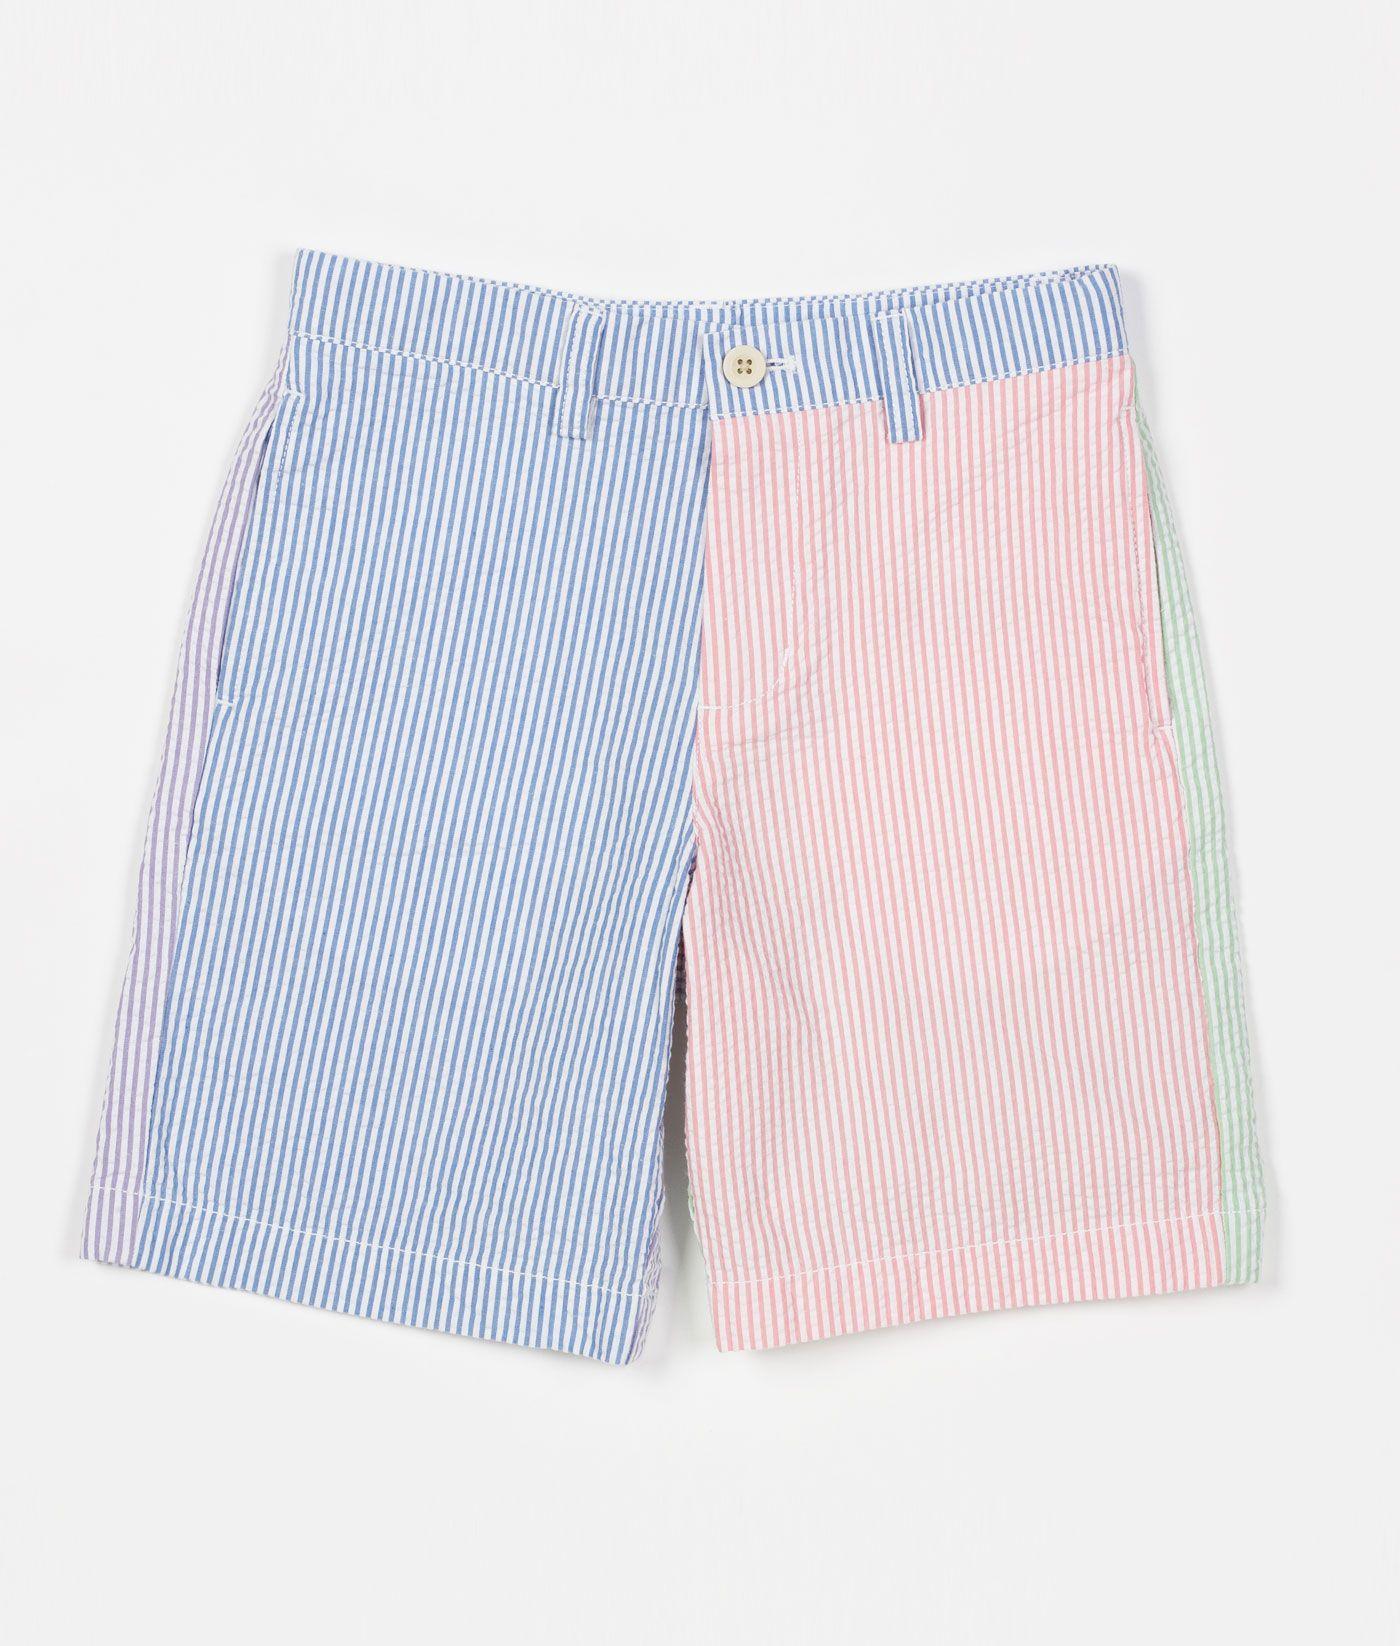 0ee016f629 Buy Little Boy's 4-Panel Seersucker Club Summer Shorts | Vineyard Vines®